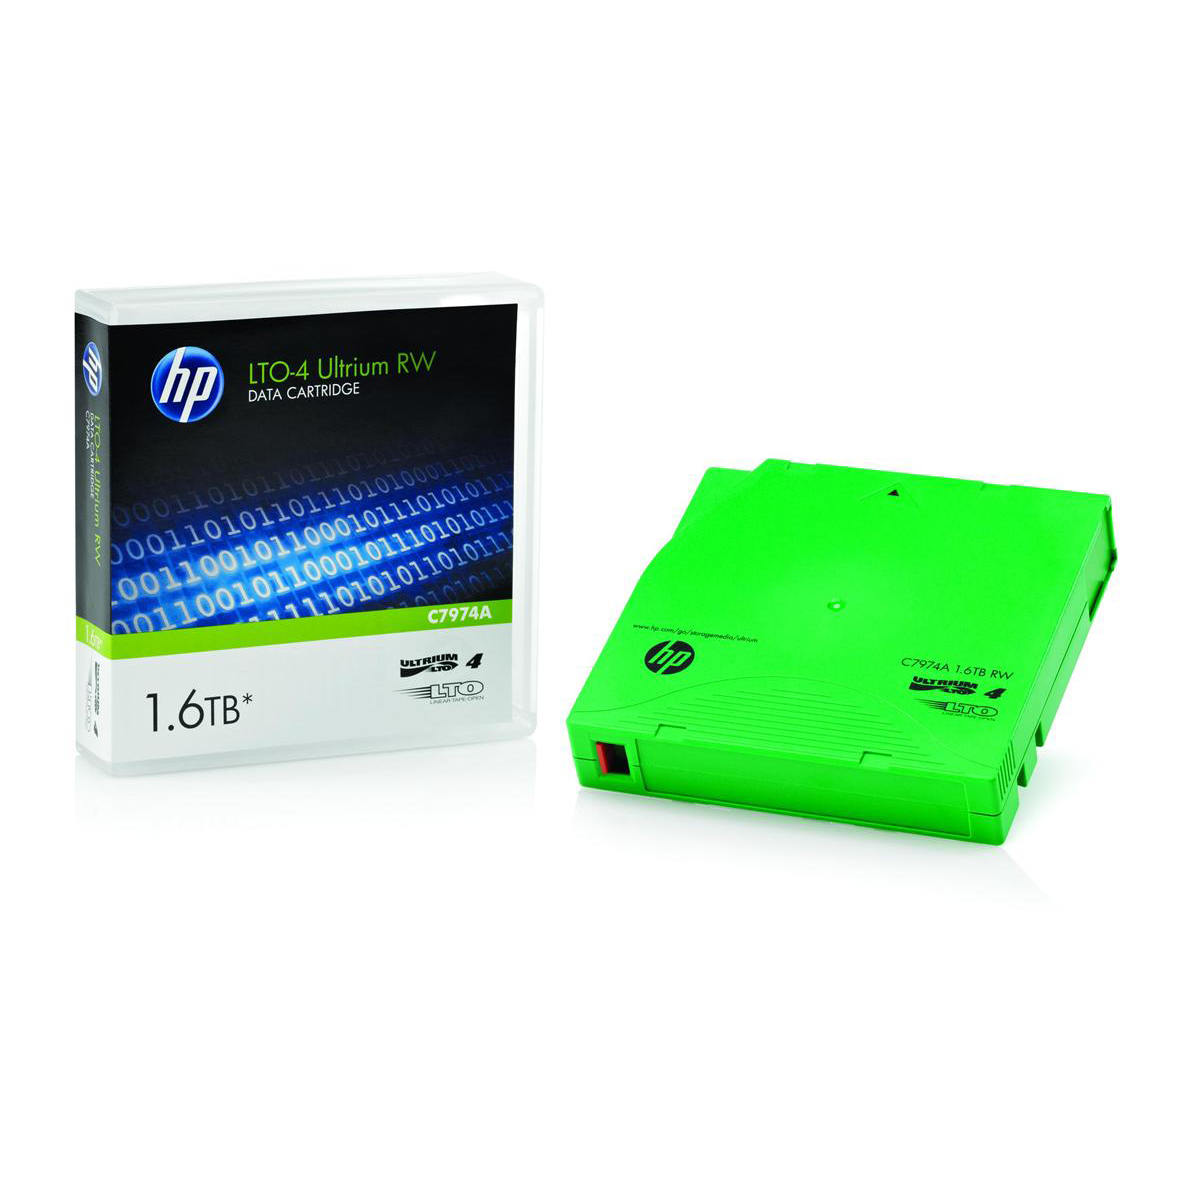 Image for HP LTO4 Ultrium Data Tape Cartridge RW 240 MB/sec 1.6TB Ref C7974A